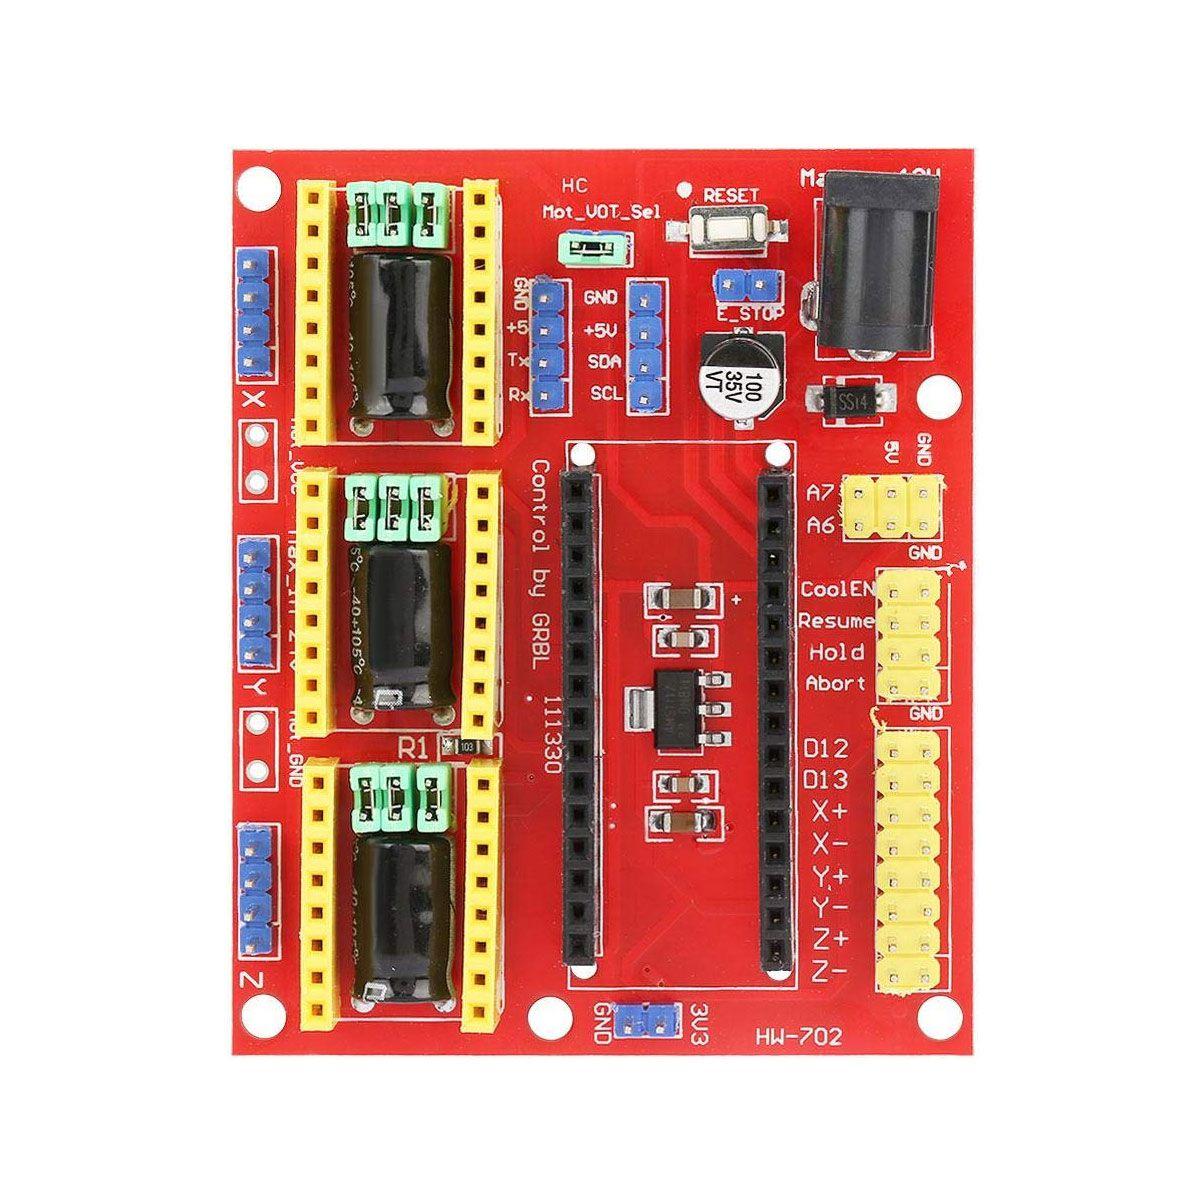 Kit Cnc Shield V4 Nano + 3x Drivers DRV8825 + 3x Dissipadores